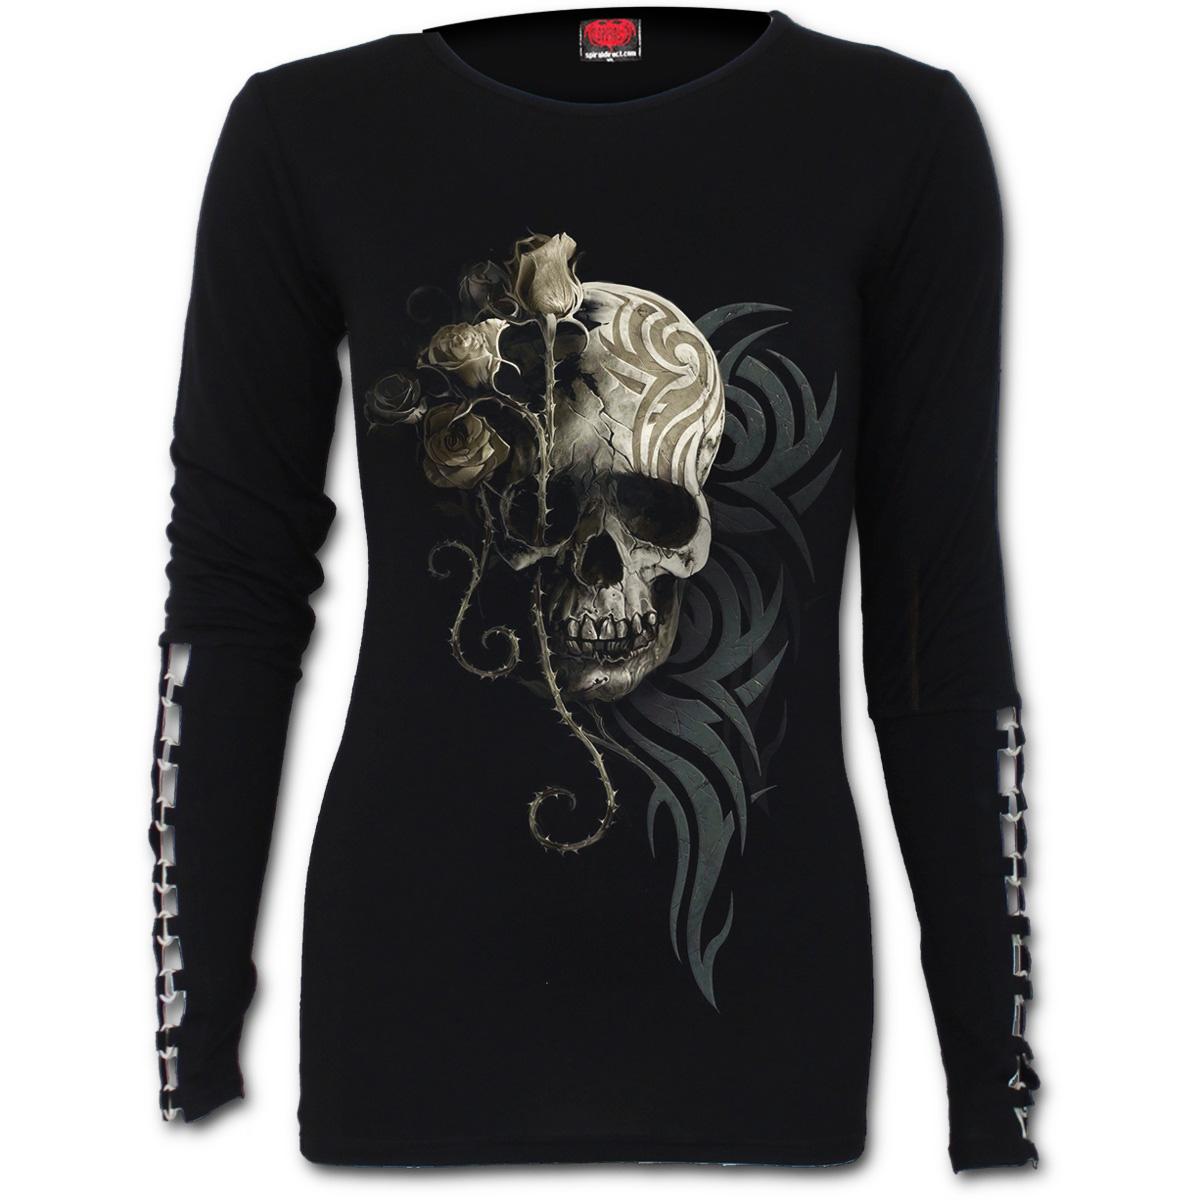 SPIRAL-DIRECT-Ladies-Black-Goth-DARK-ANGEL-Skull-Buckle-L-Sleeve-All-Sizes thumbnail 7